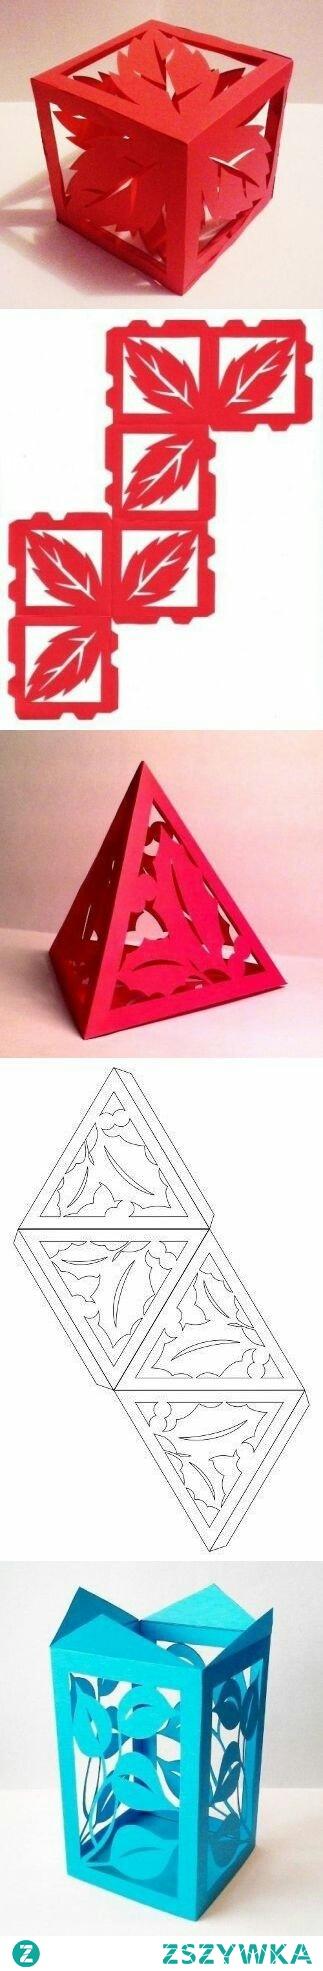 Lampioniki z papieru